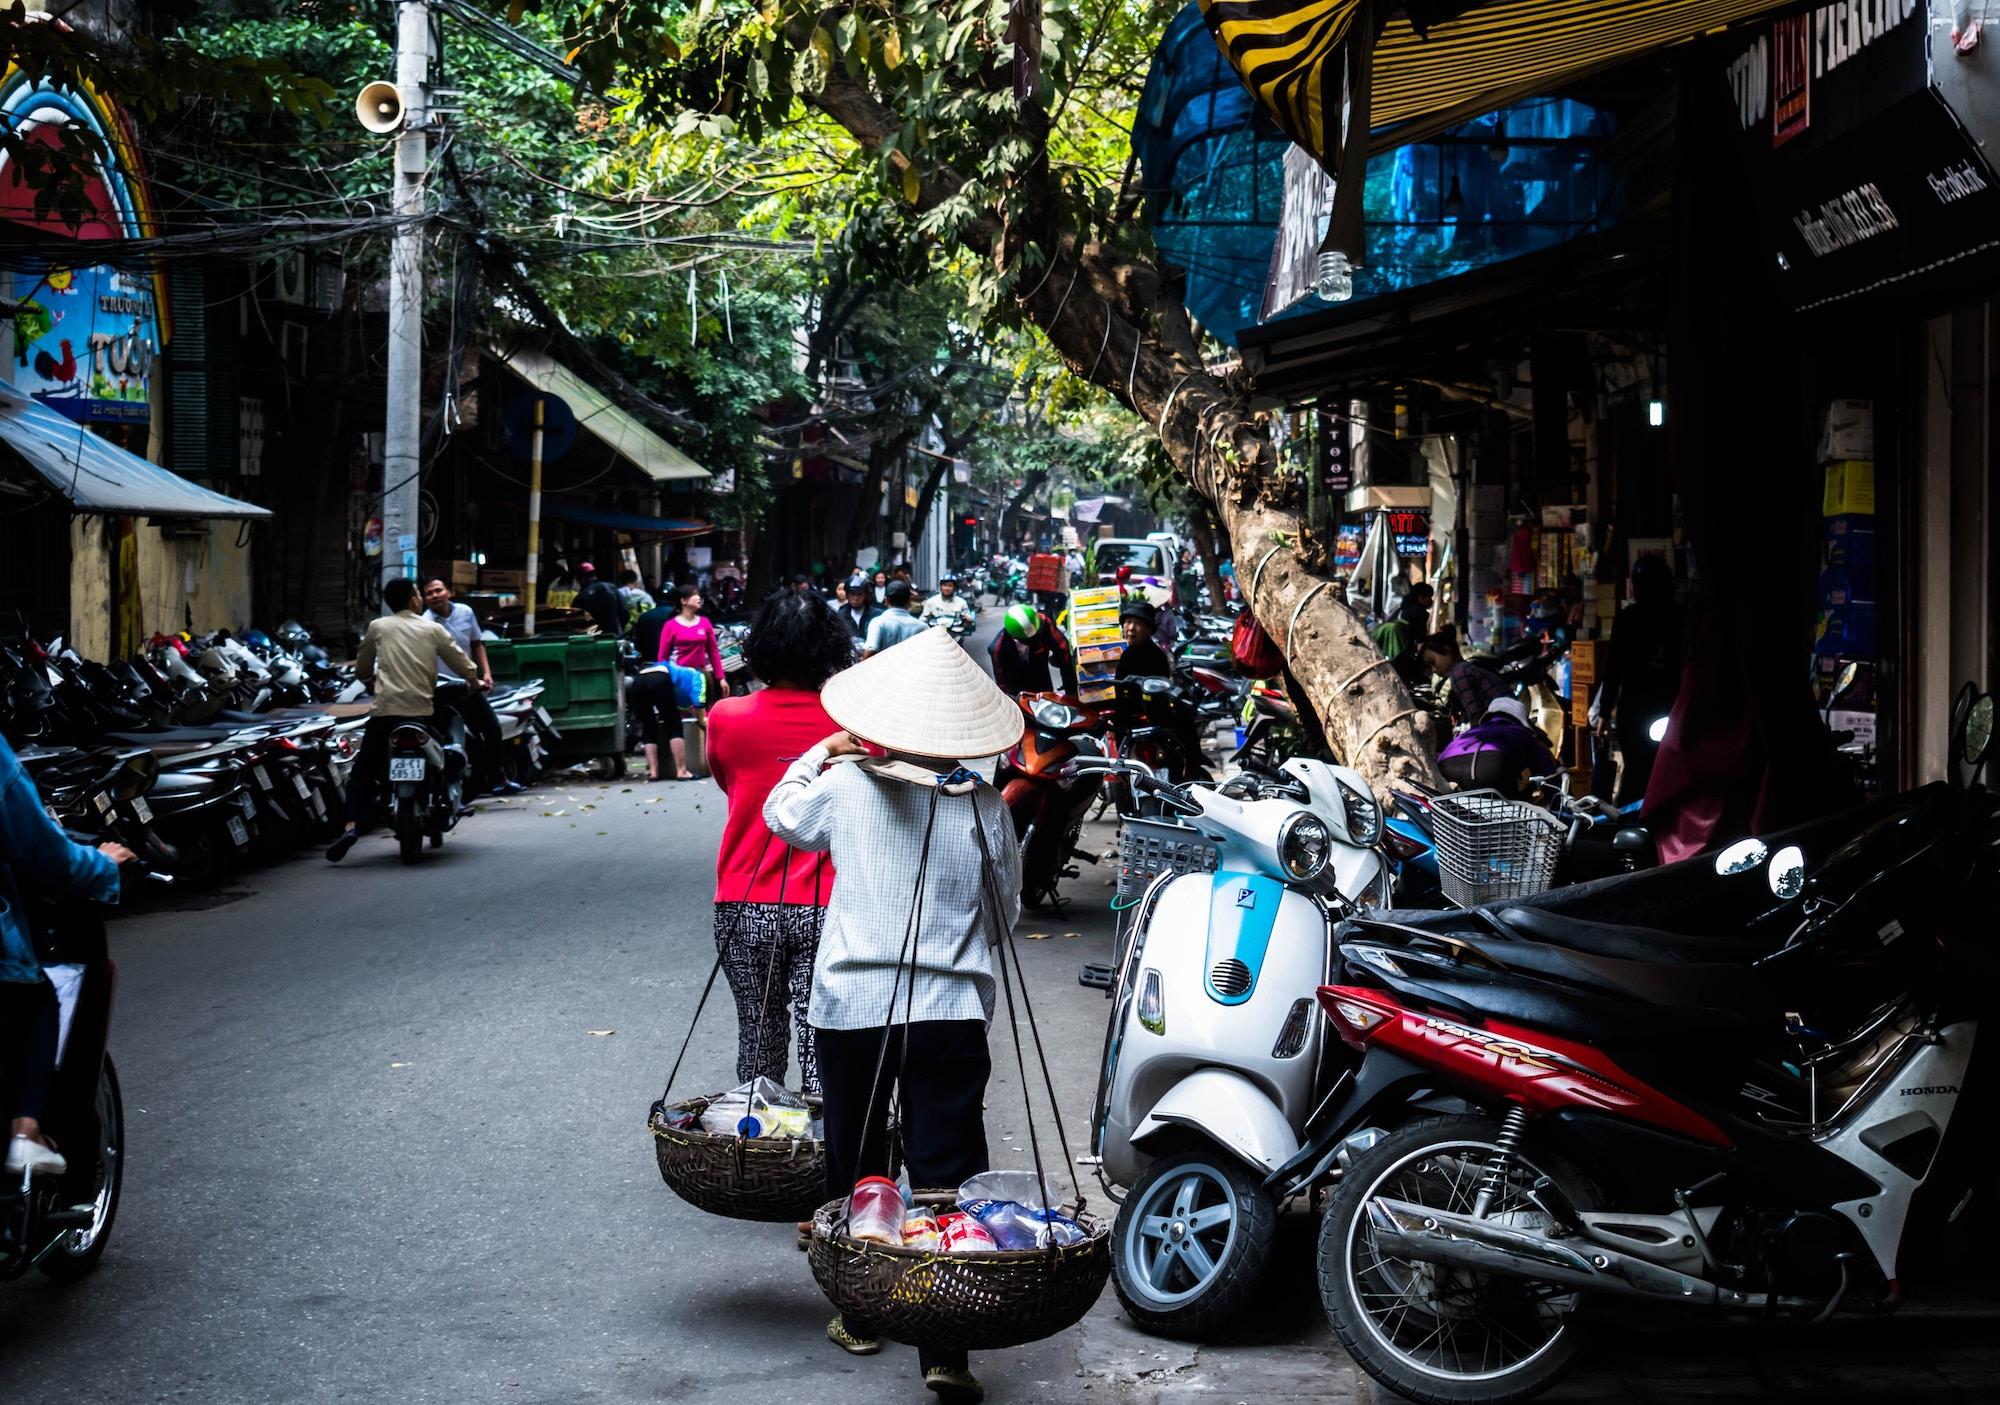 ho-chi-minh-city-yoga-studios-vietnam.jpg